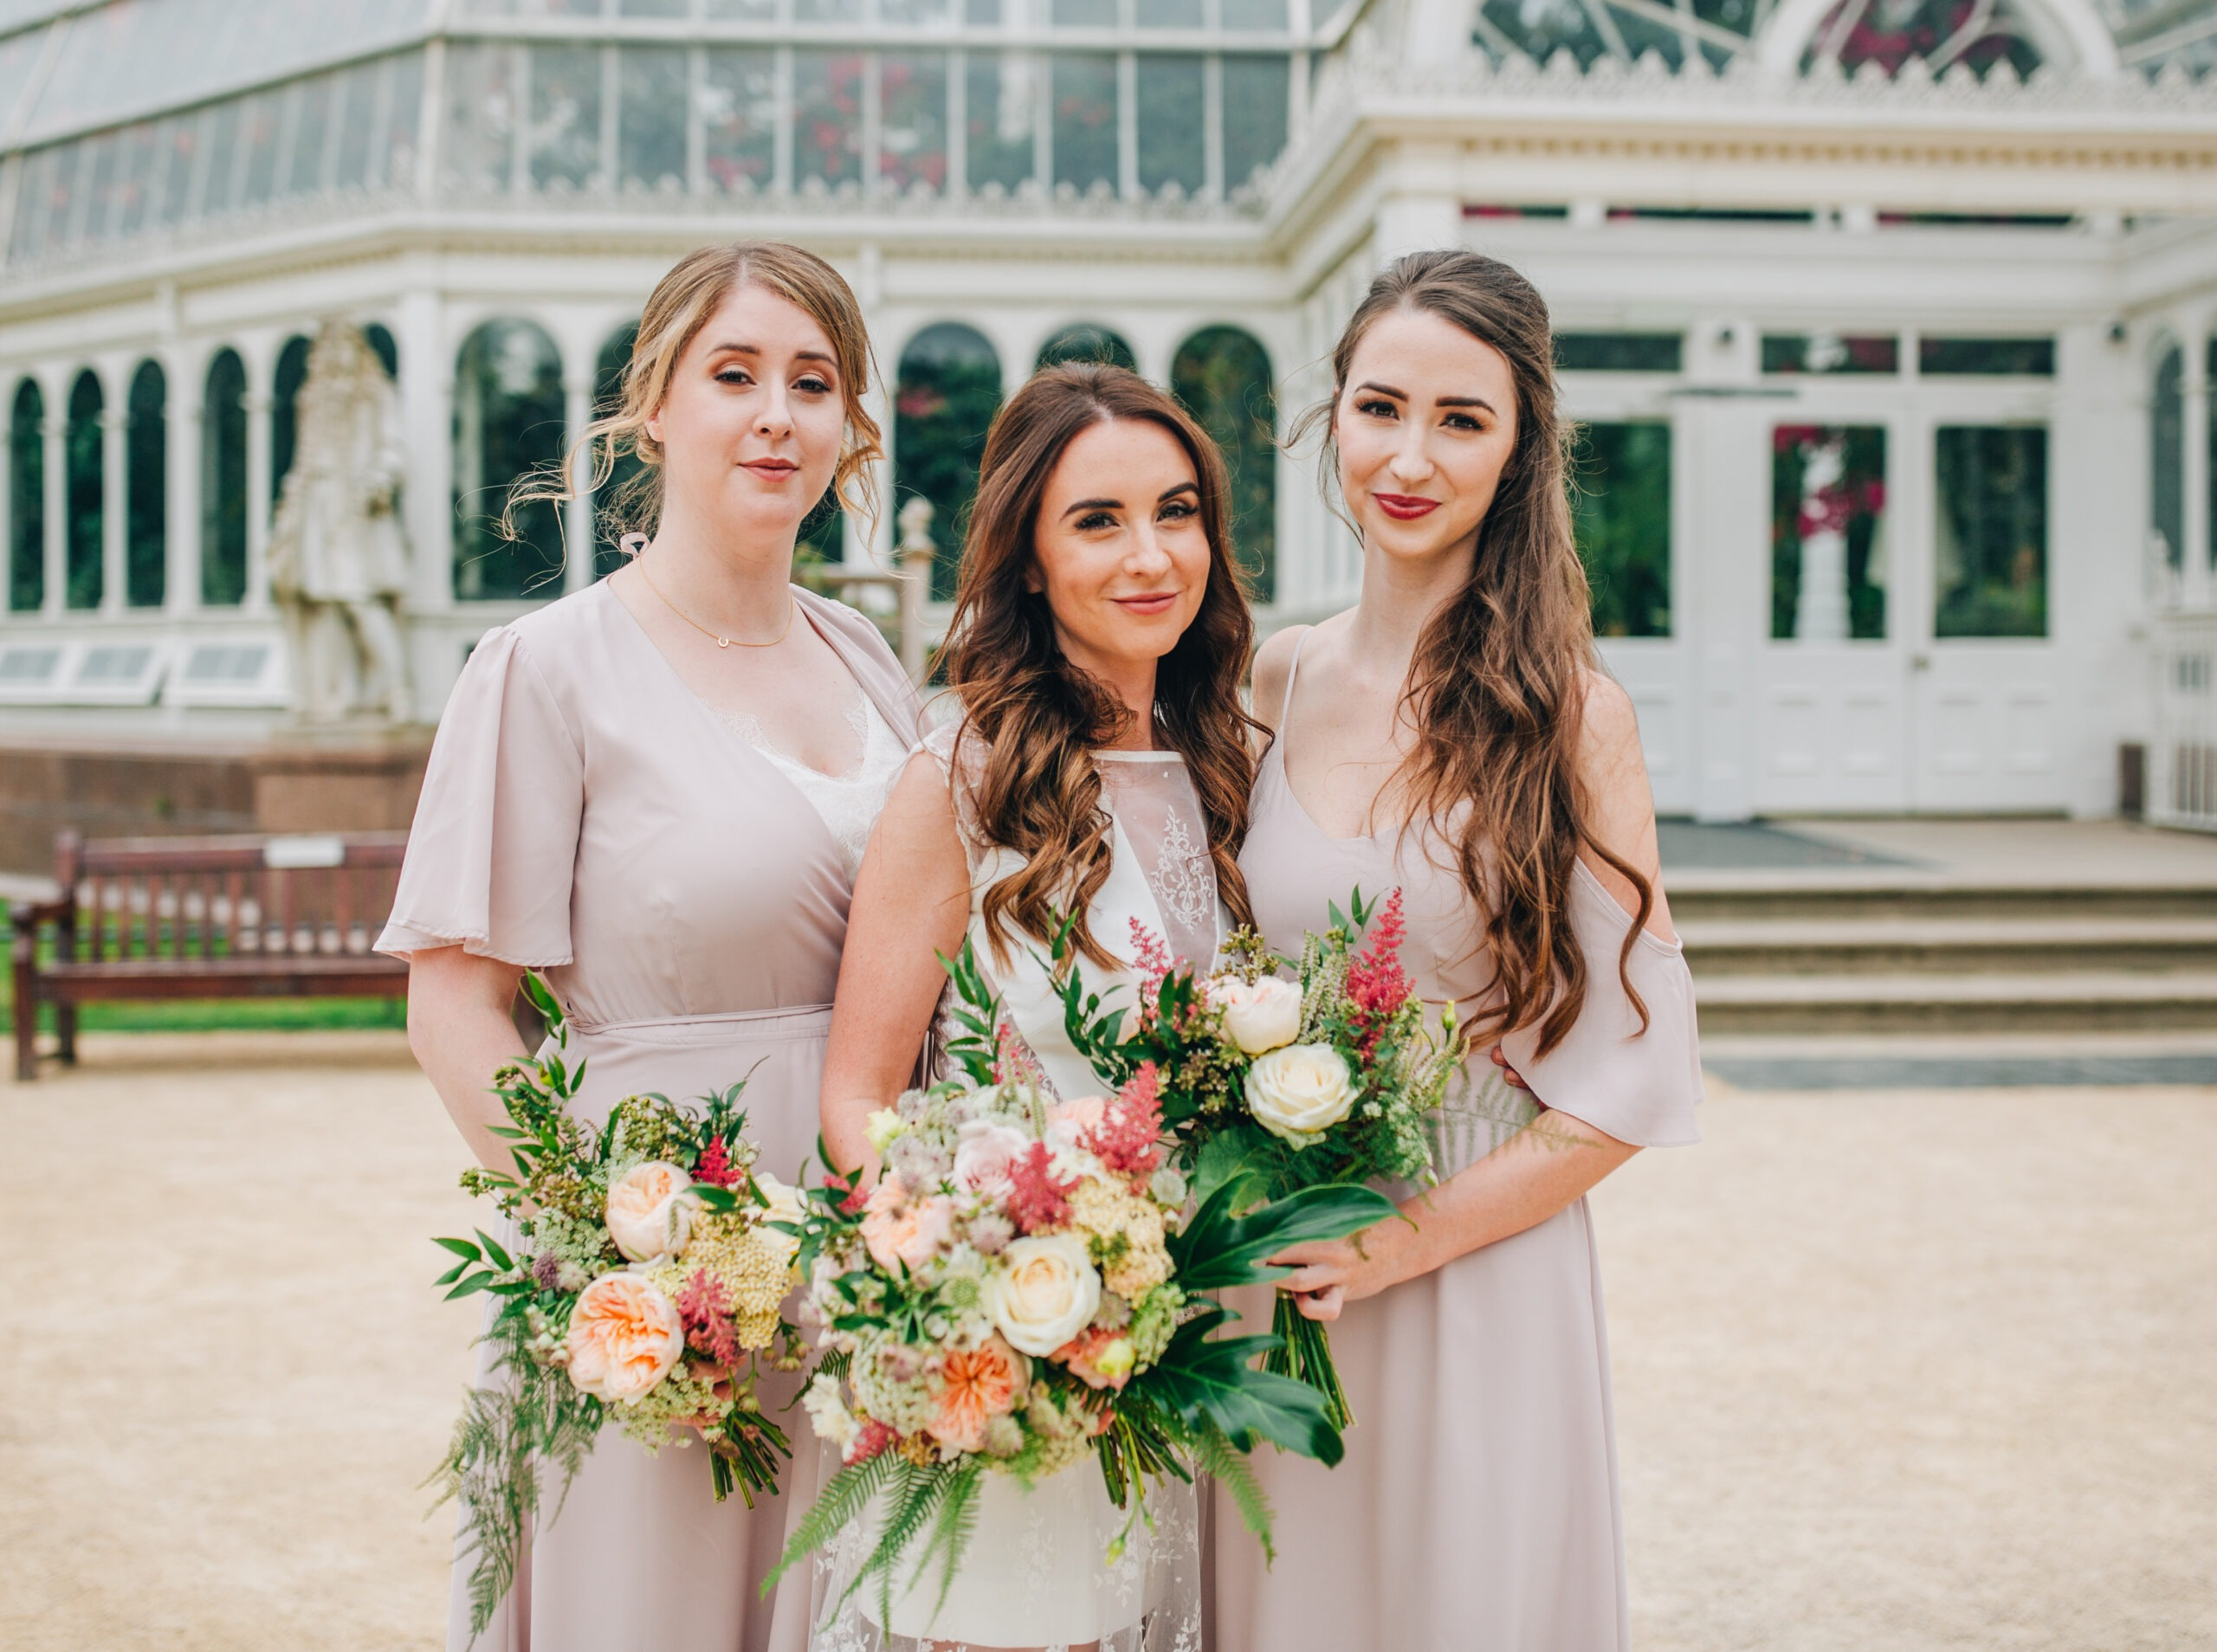 Sefton Park Palm House wedding makeup artist Liverpool